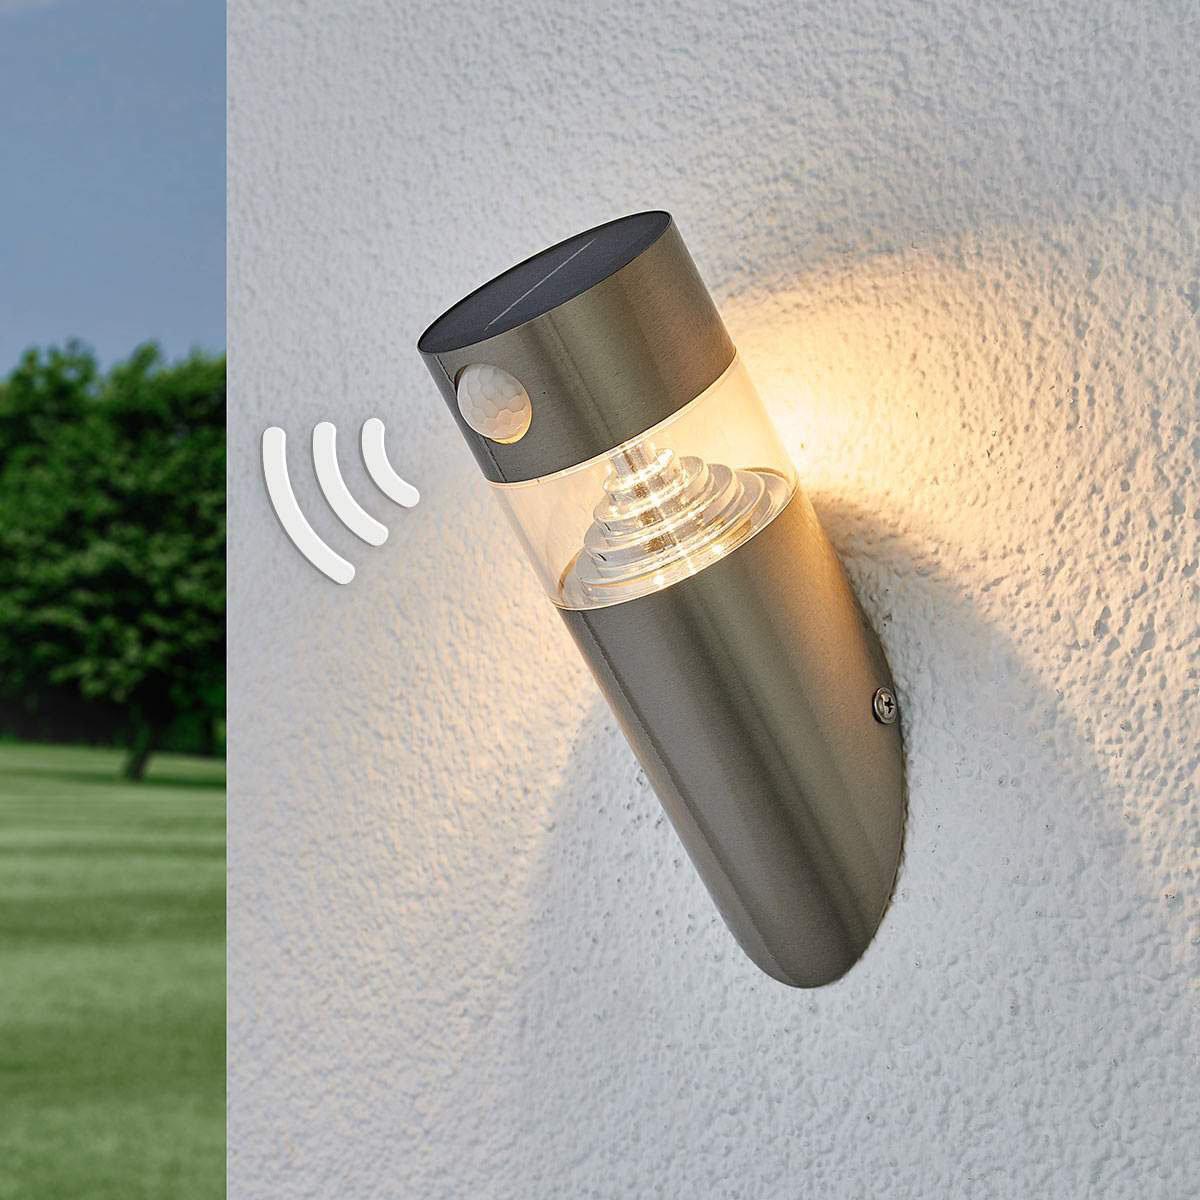 Solar-LED-Wandlampe Kalypso mit Bewegungsmelder, 21,3x7,6x7,6 cm, Edelstahl, silber